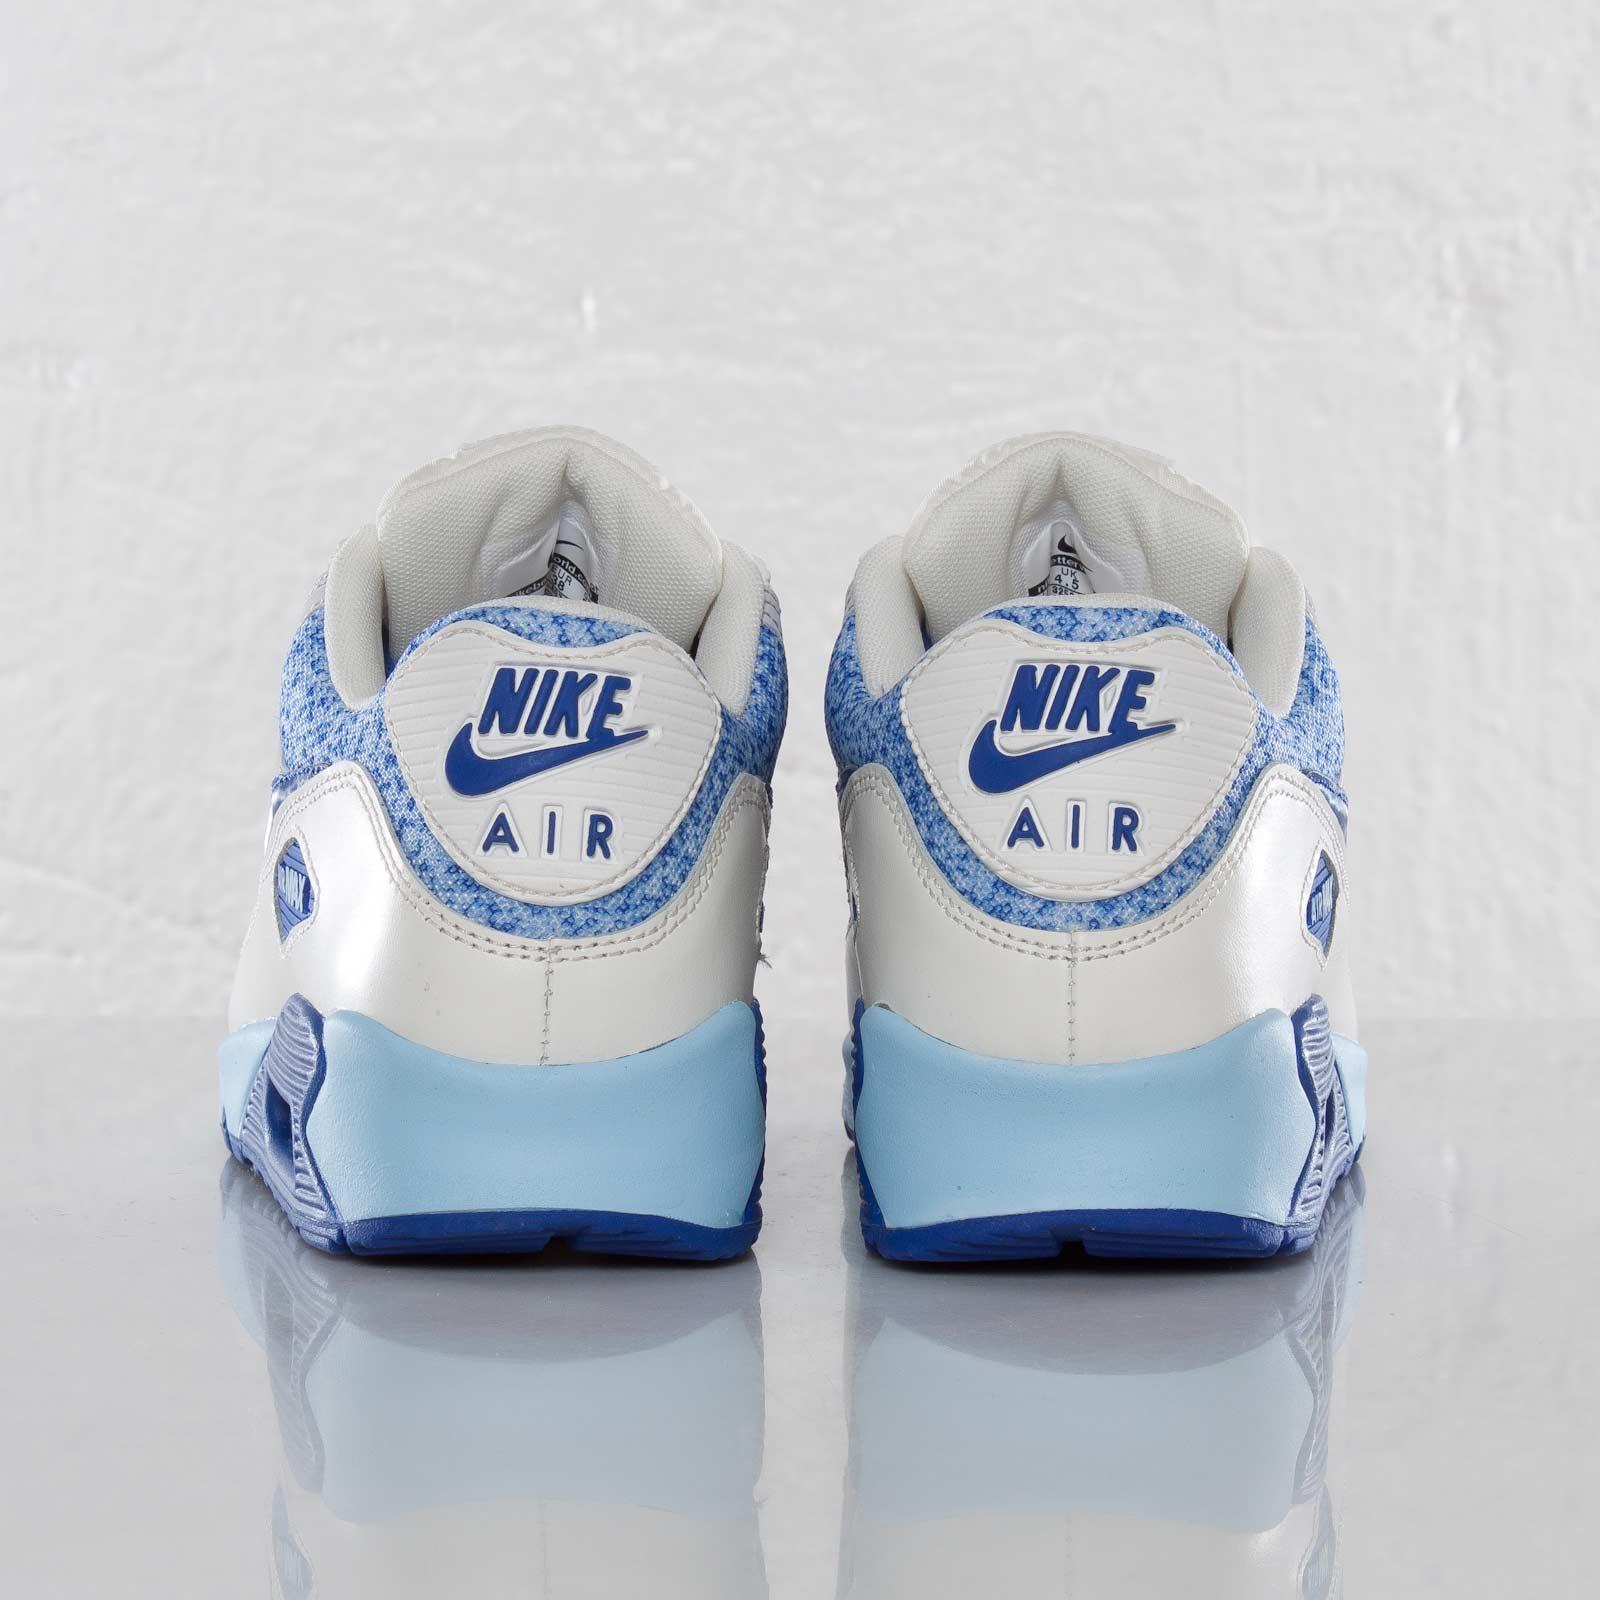 pretty nice c4e7c ce46f Nike Wmns Air Max 90 - 325213-407 - Sneakersnstuff   sneakers   streetwear  online since 1999